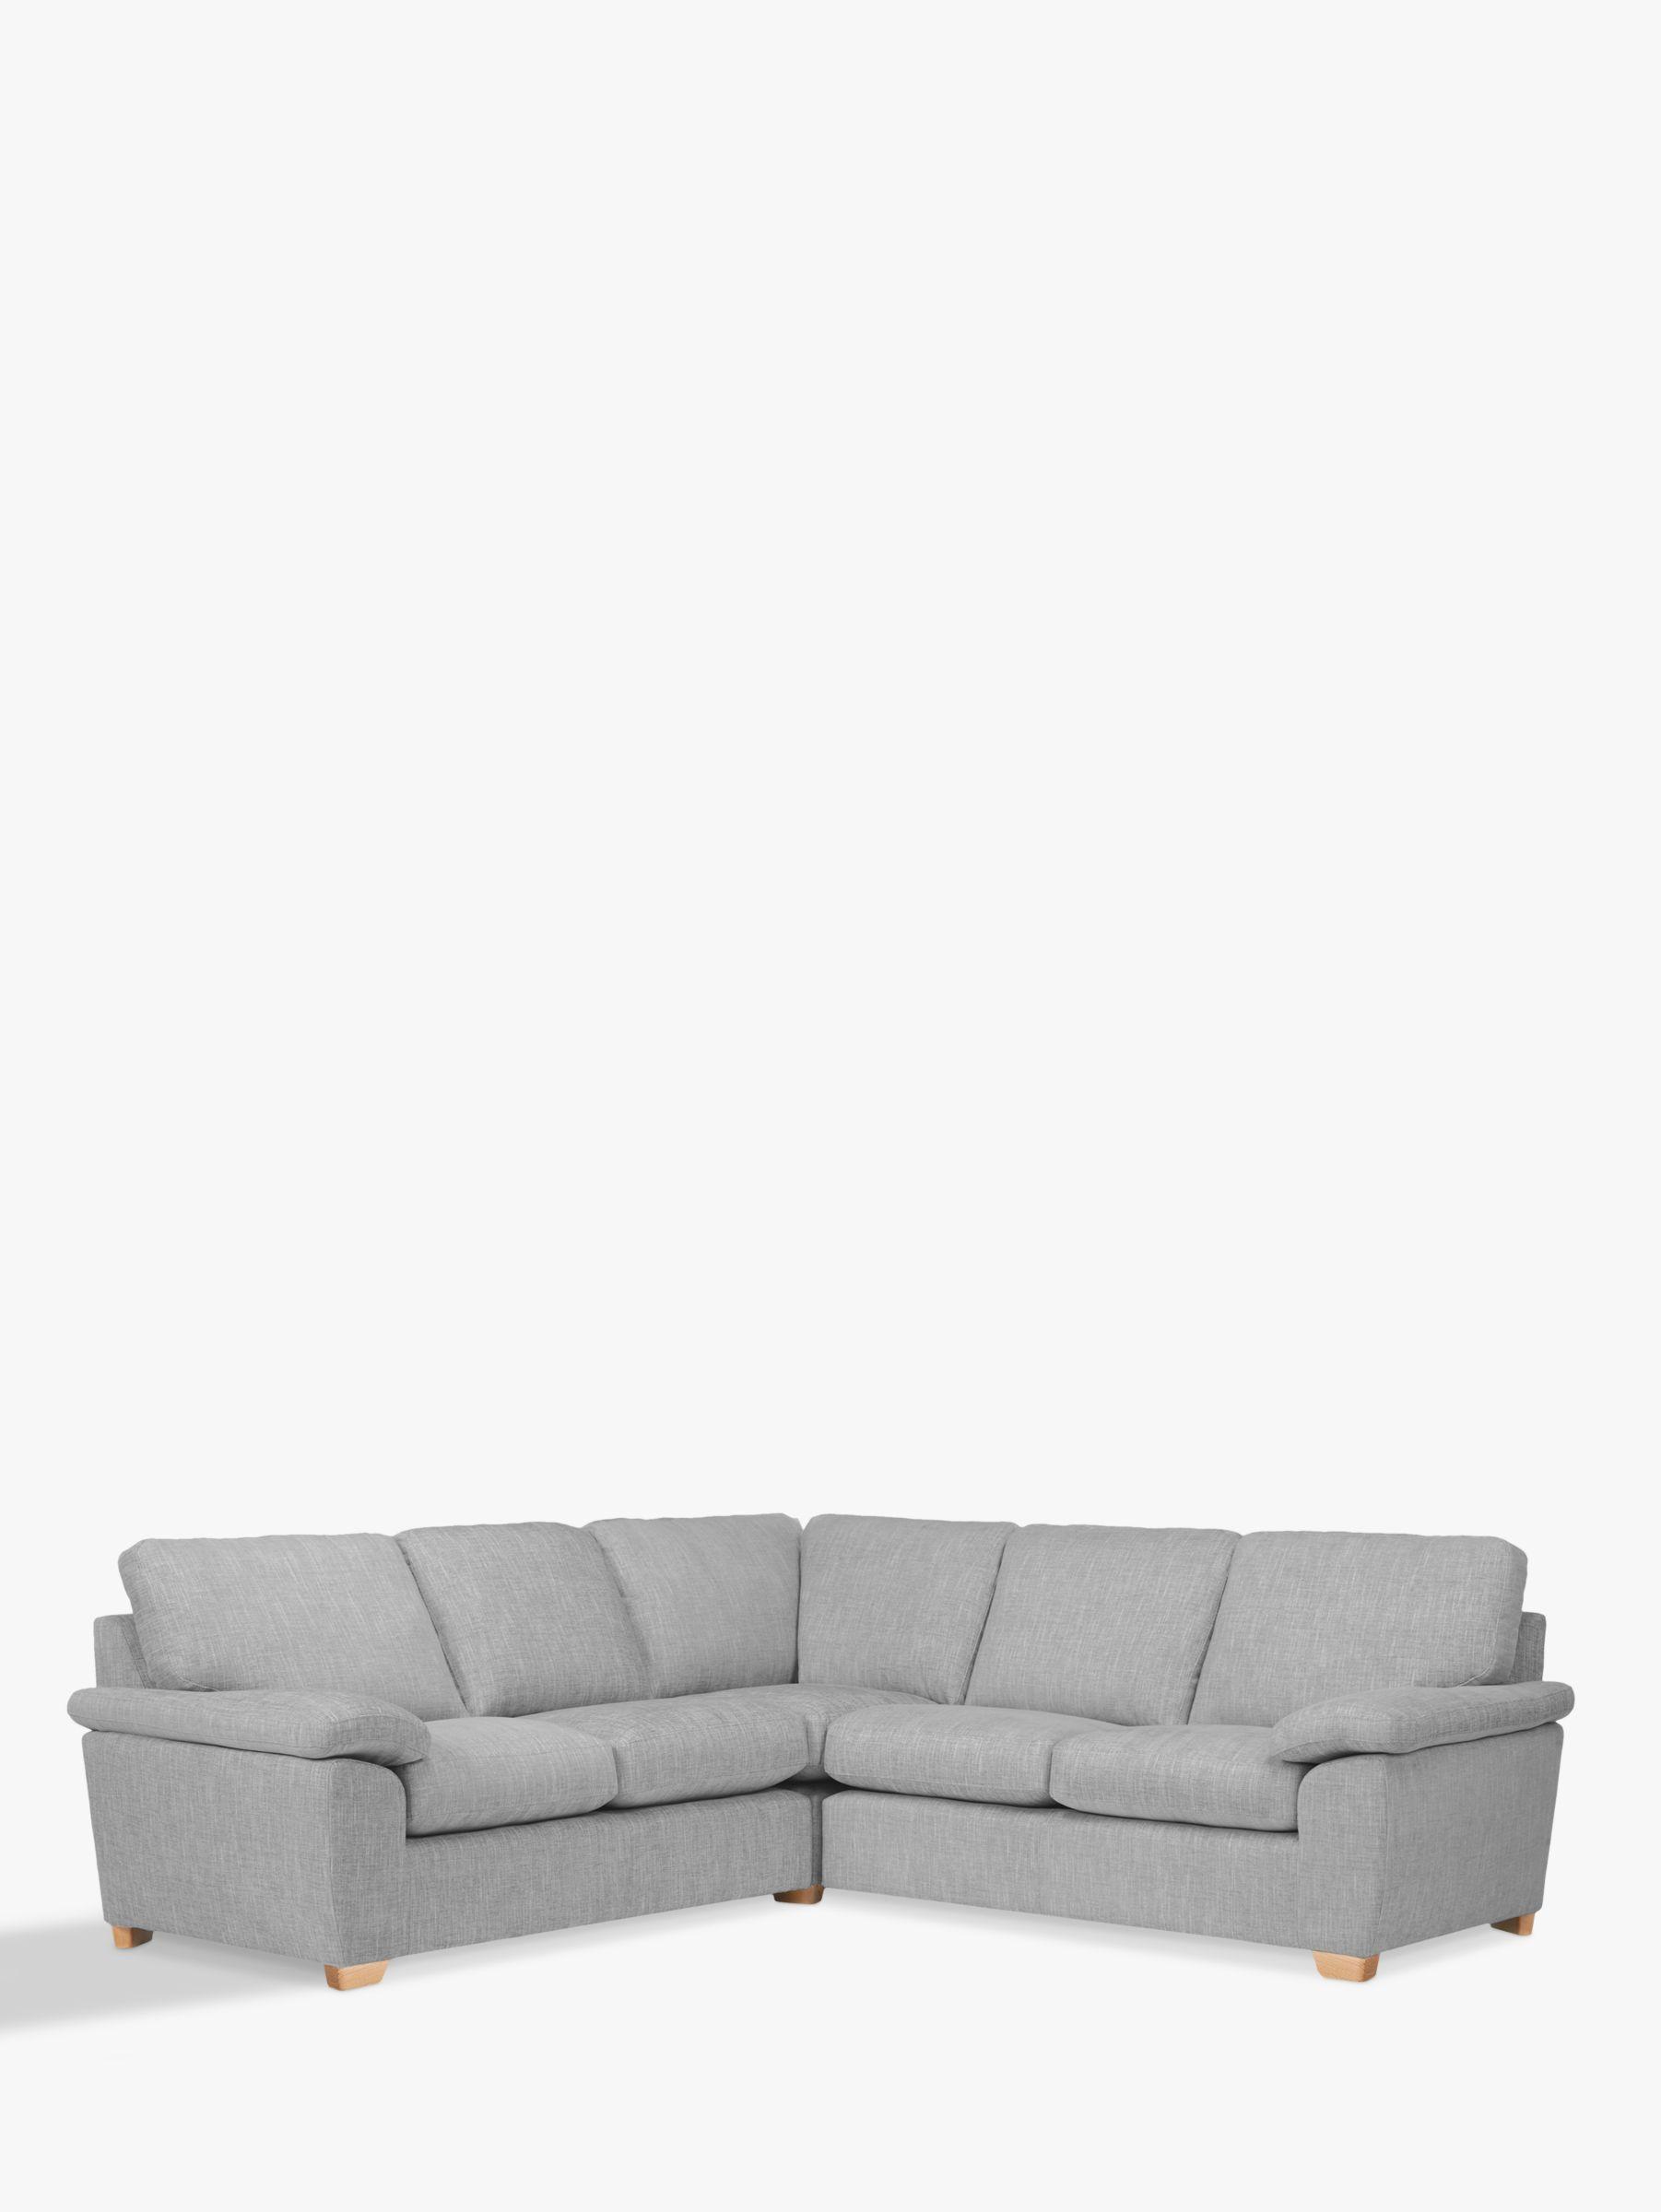 camden sofa john lewis armchairs world and partners corner at